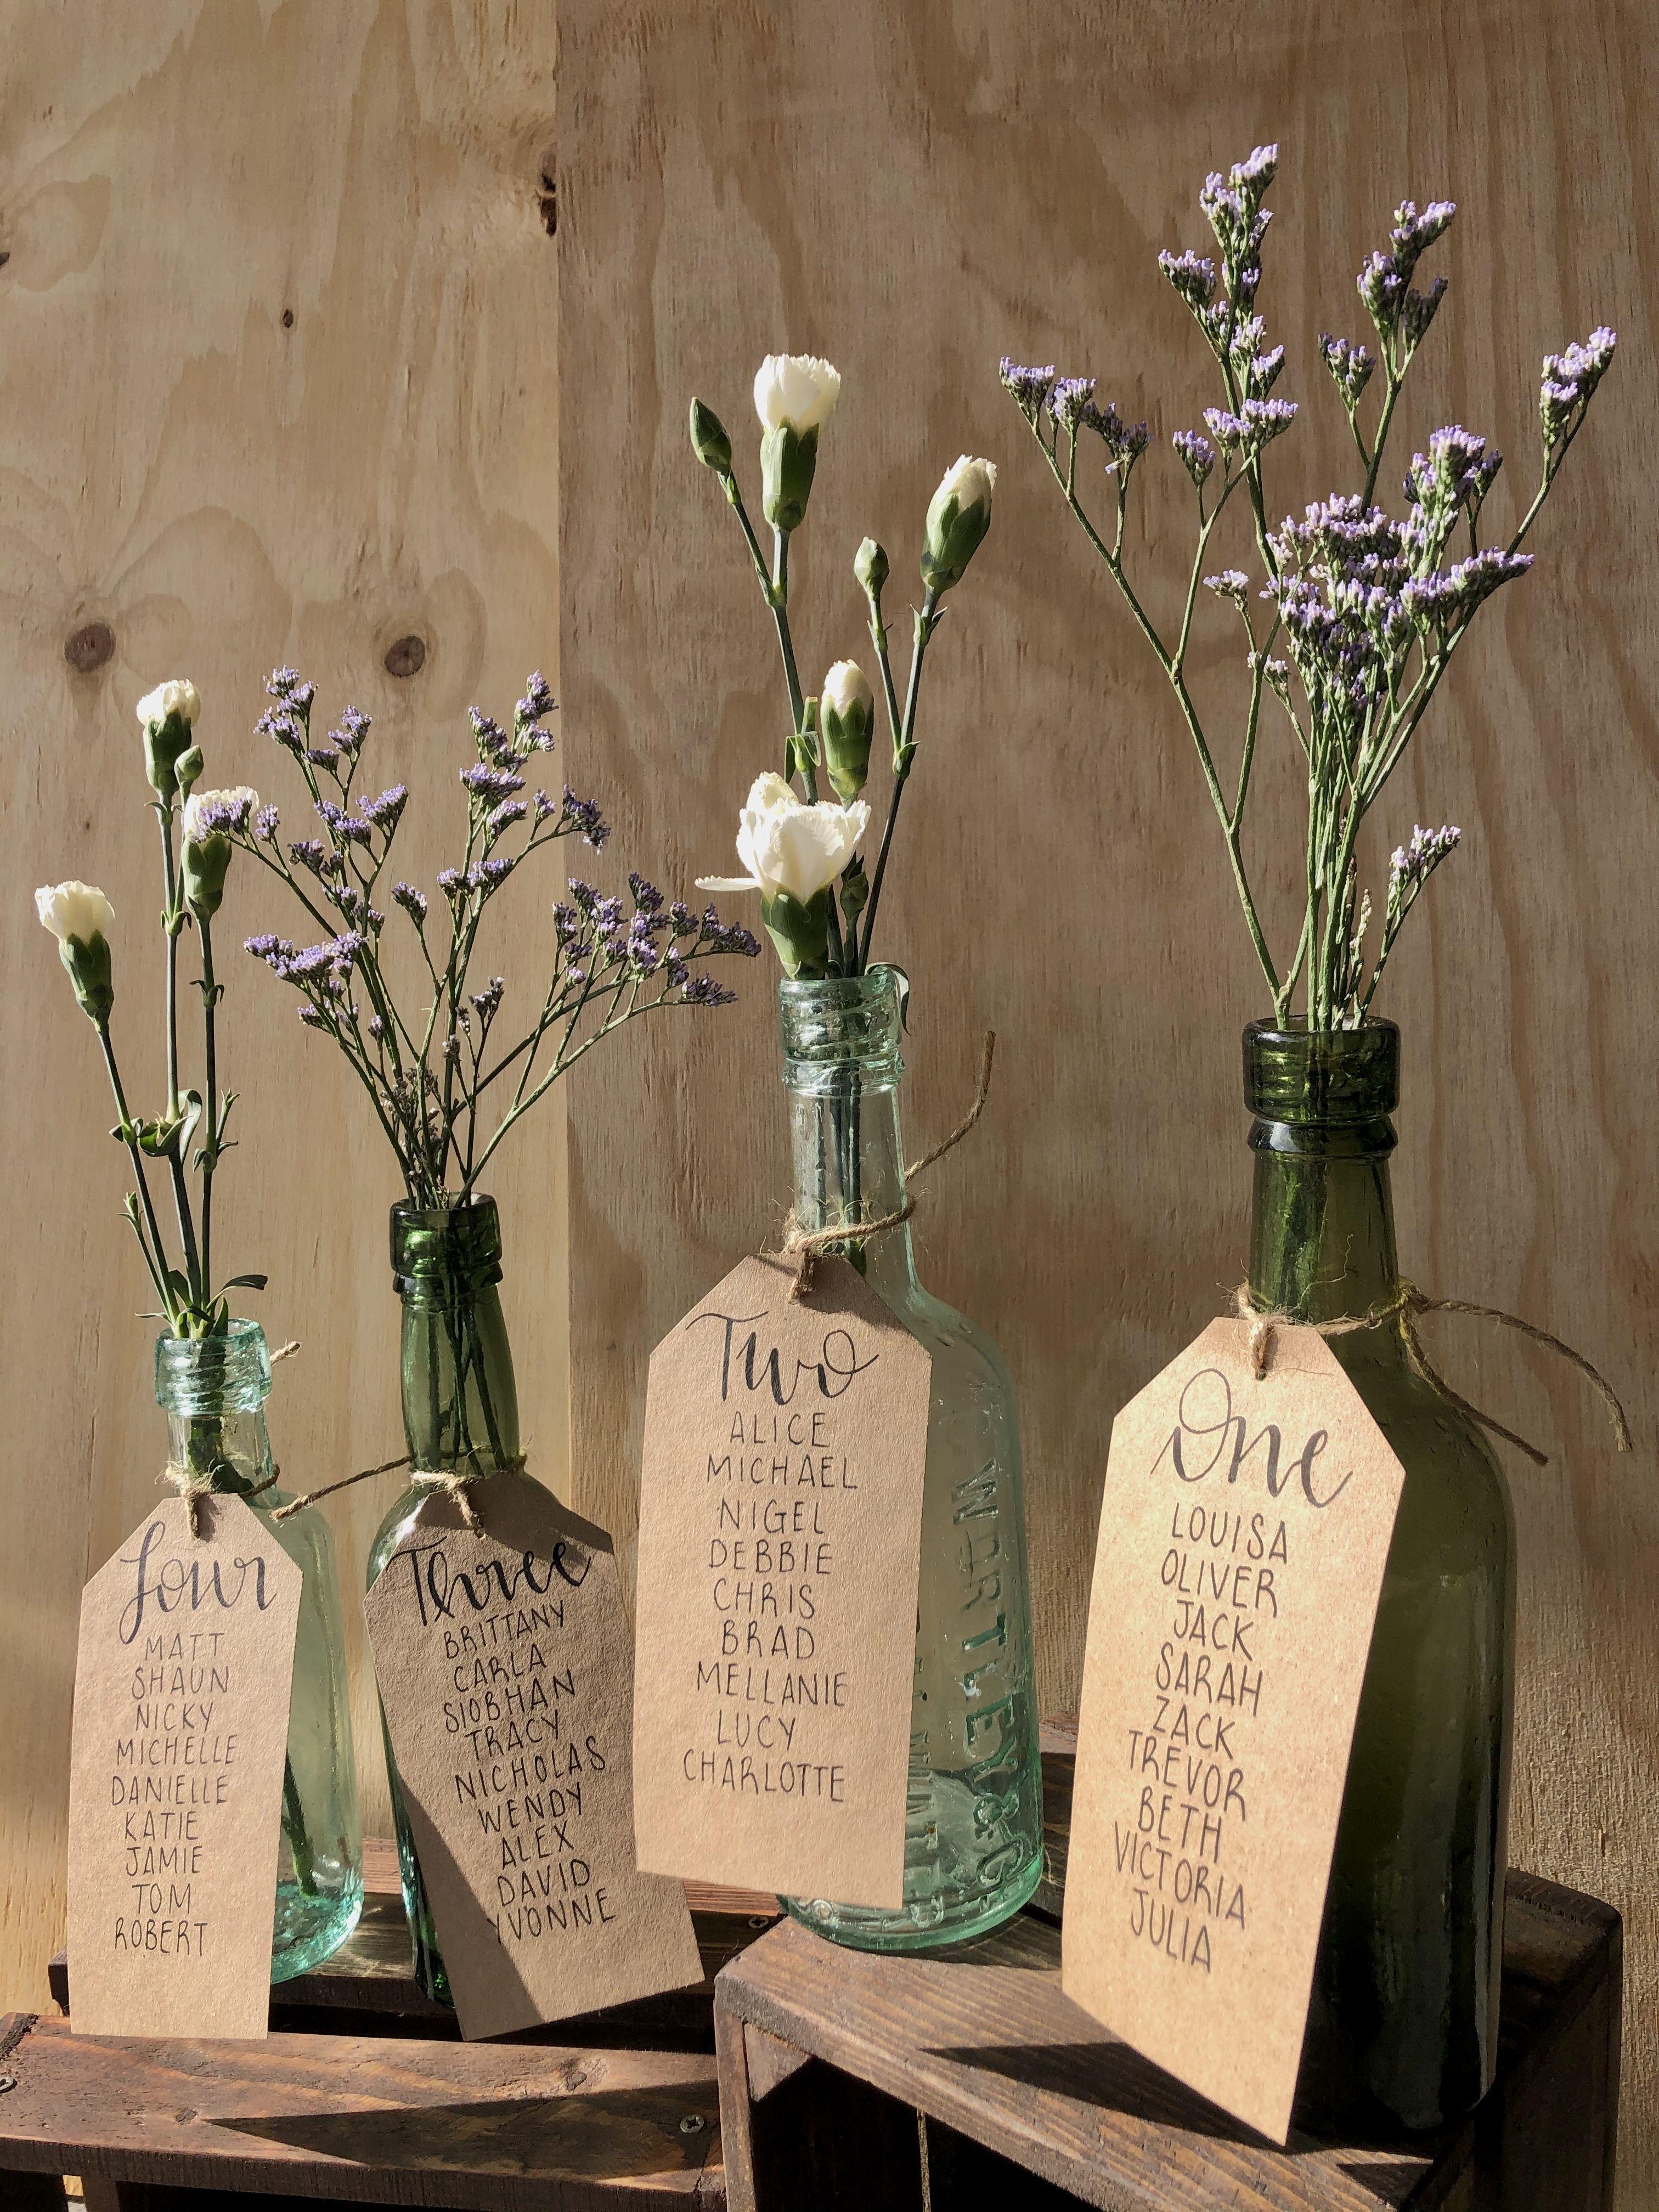 Antique Bottle Rustic Boho Wedding Seating / Table Plan Idea